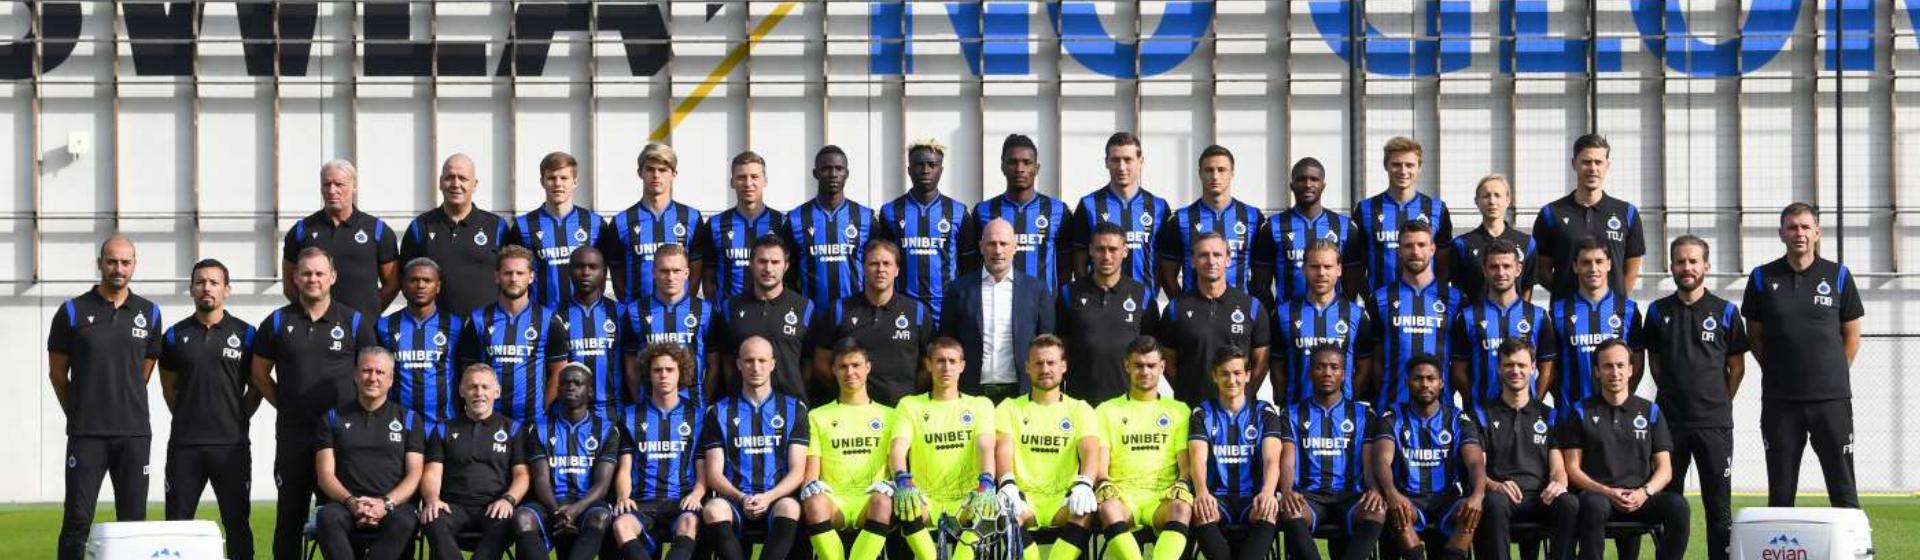 Club Brugge header